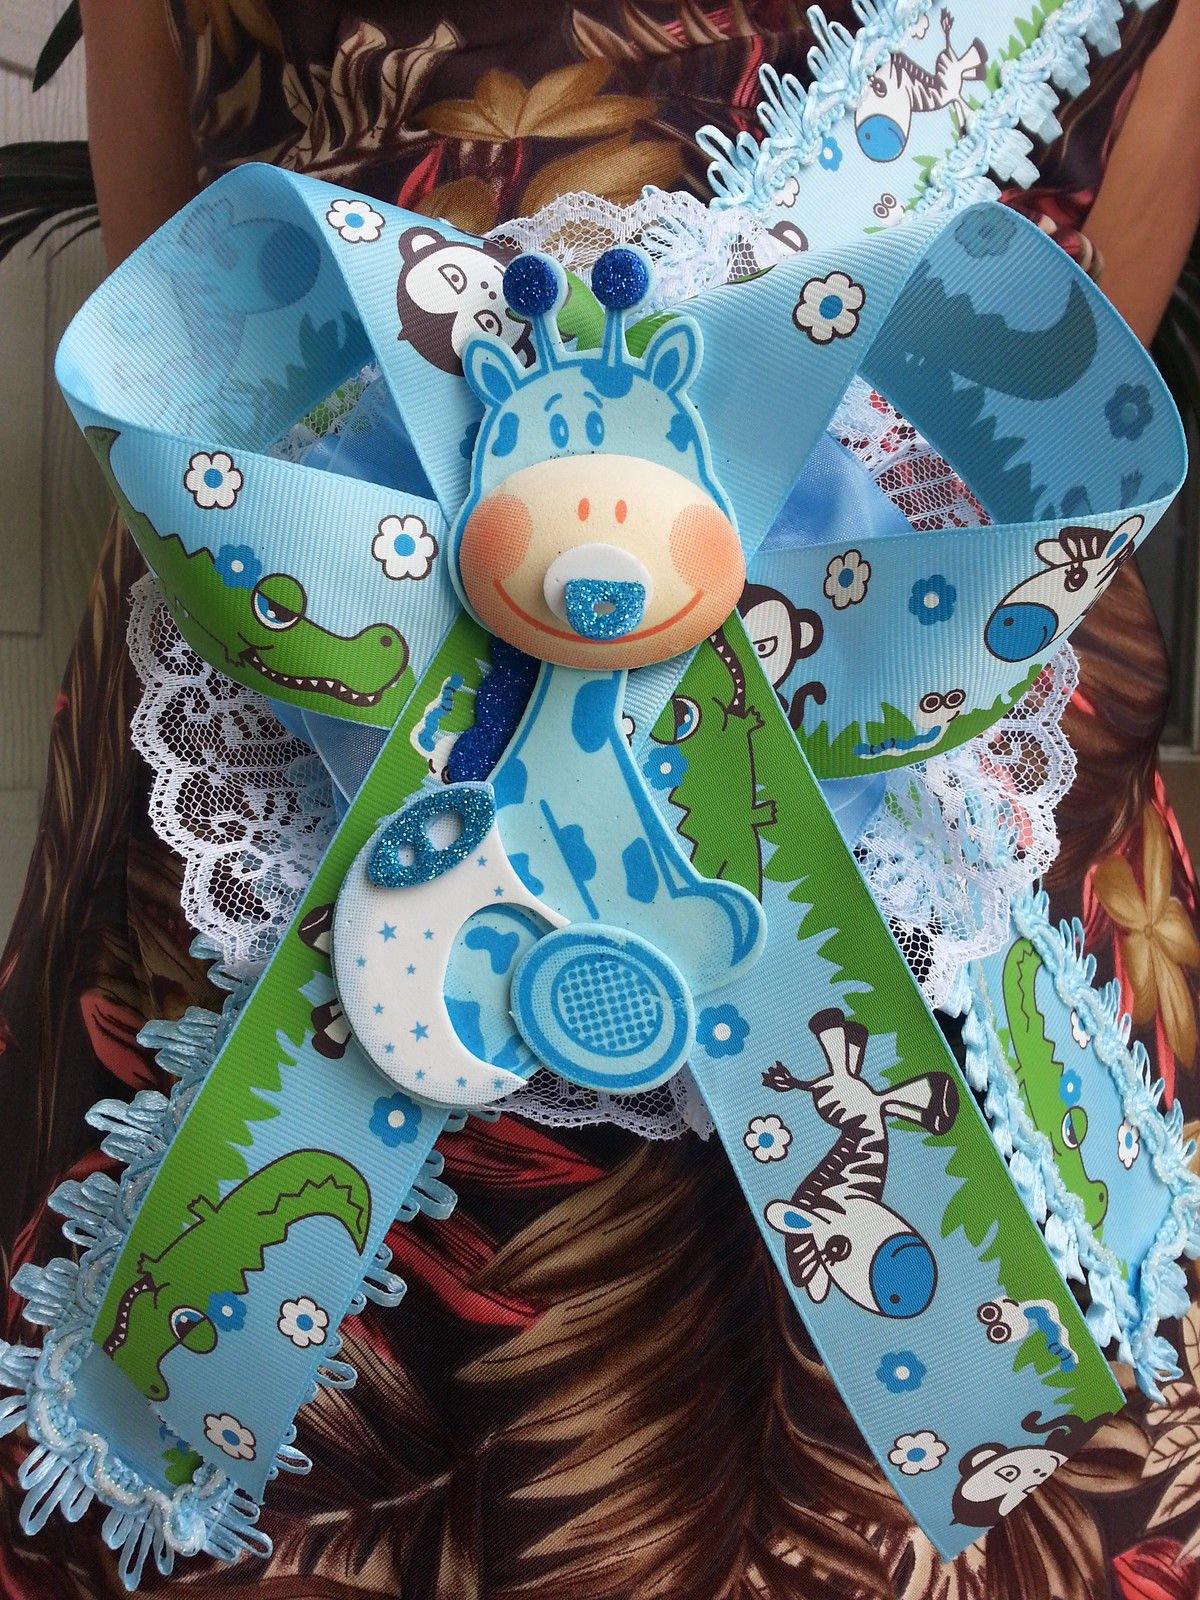 Baby Shower Mom To Be It's a Boy Sash Blue Giraffe Safari Ribbon Corsage Noah's by PRODUCT 789 (Image #3)